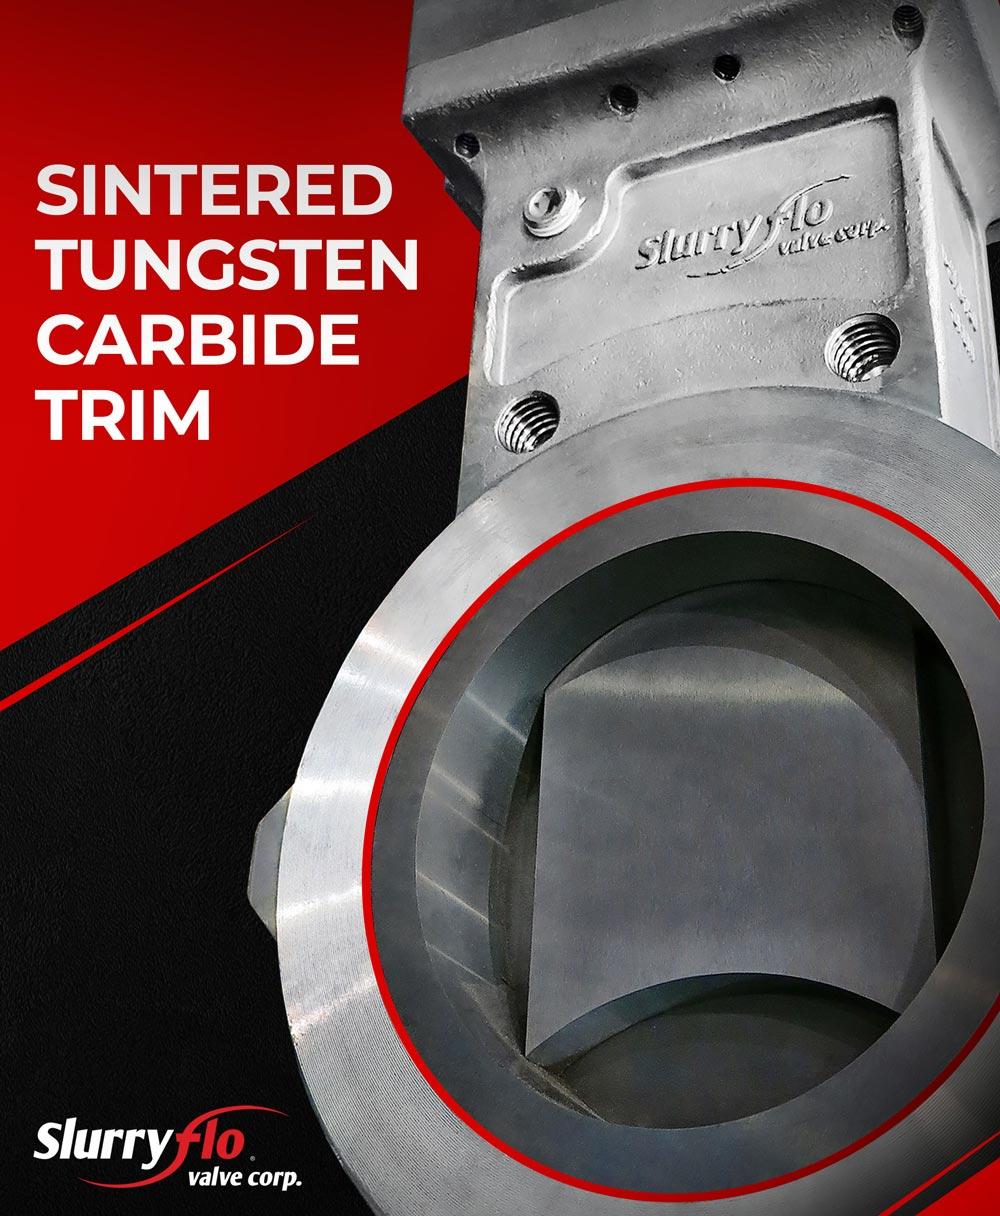 SlurryFlo wear components are made of Sintered Tungsten Carbide